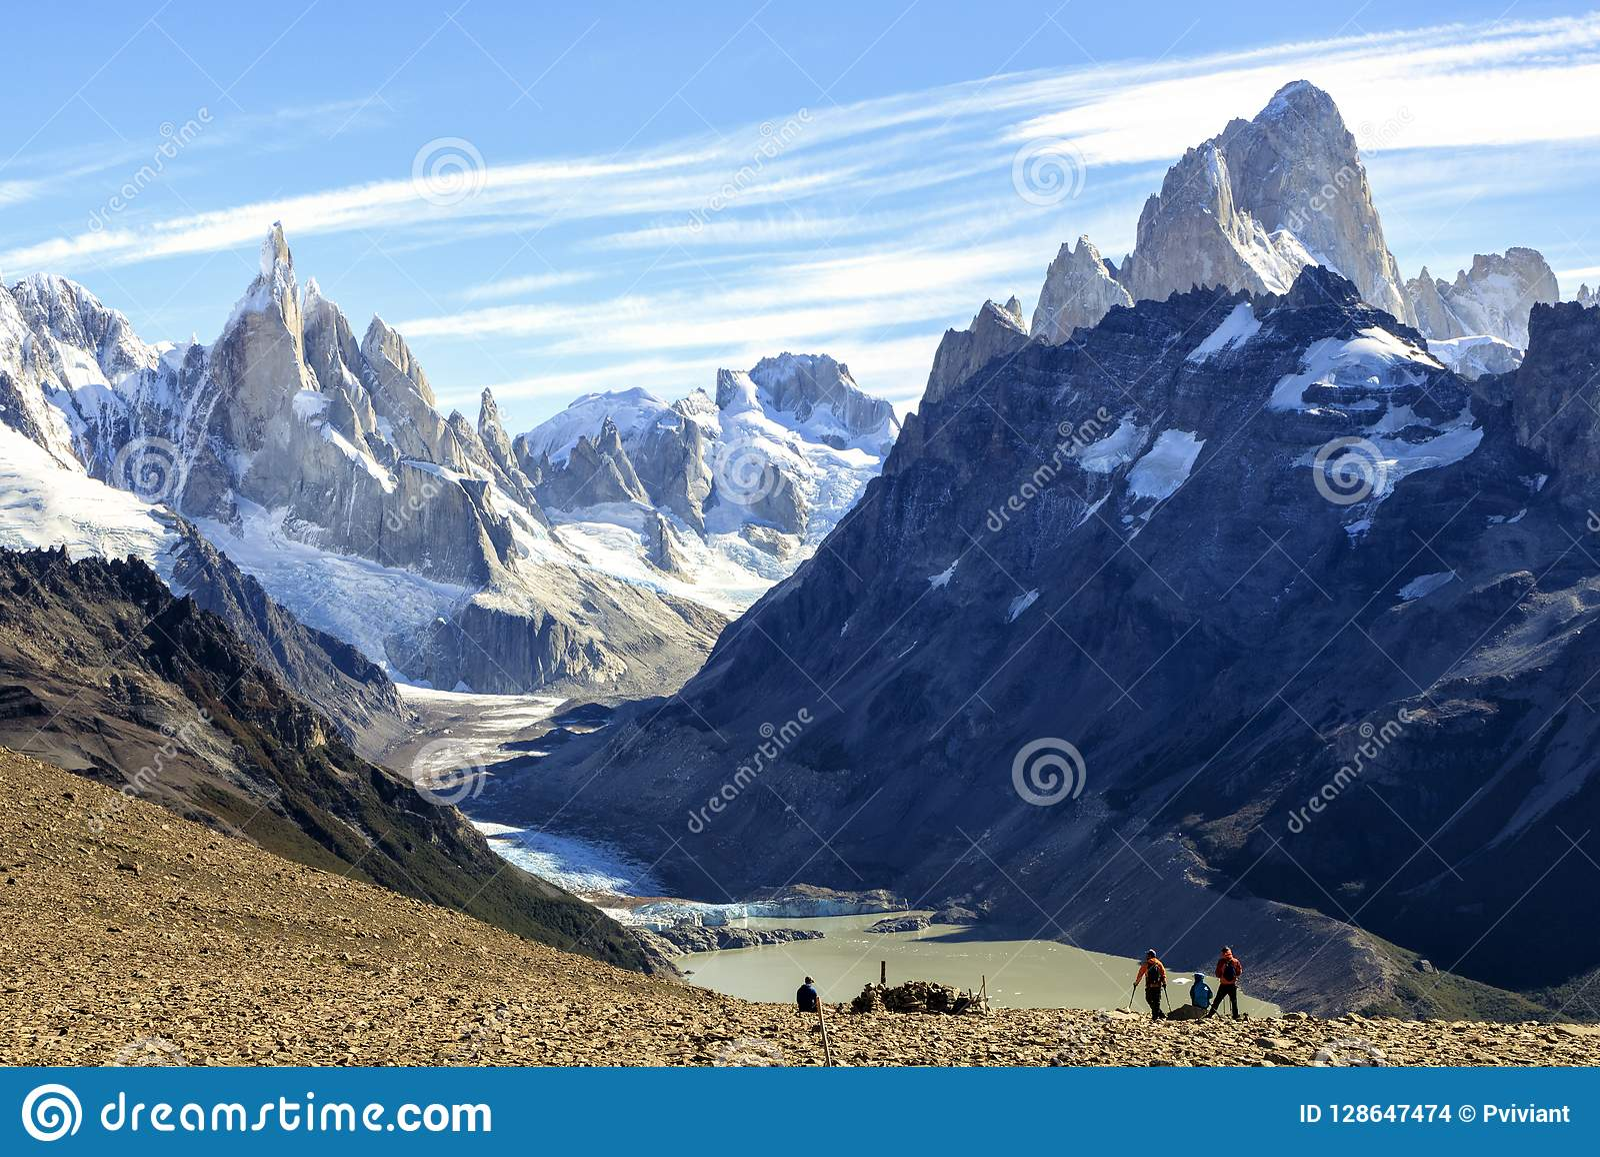 EL Chalten, η μαγική πόλη το φθινόπωρο Η EL Chalten βρίσκεται στην αργεντινή Παταγωνία